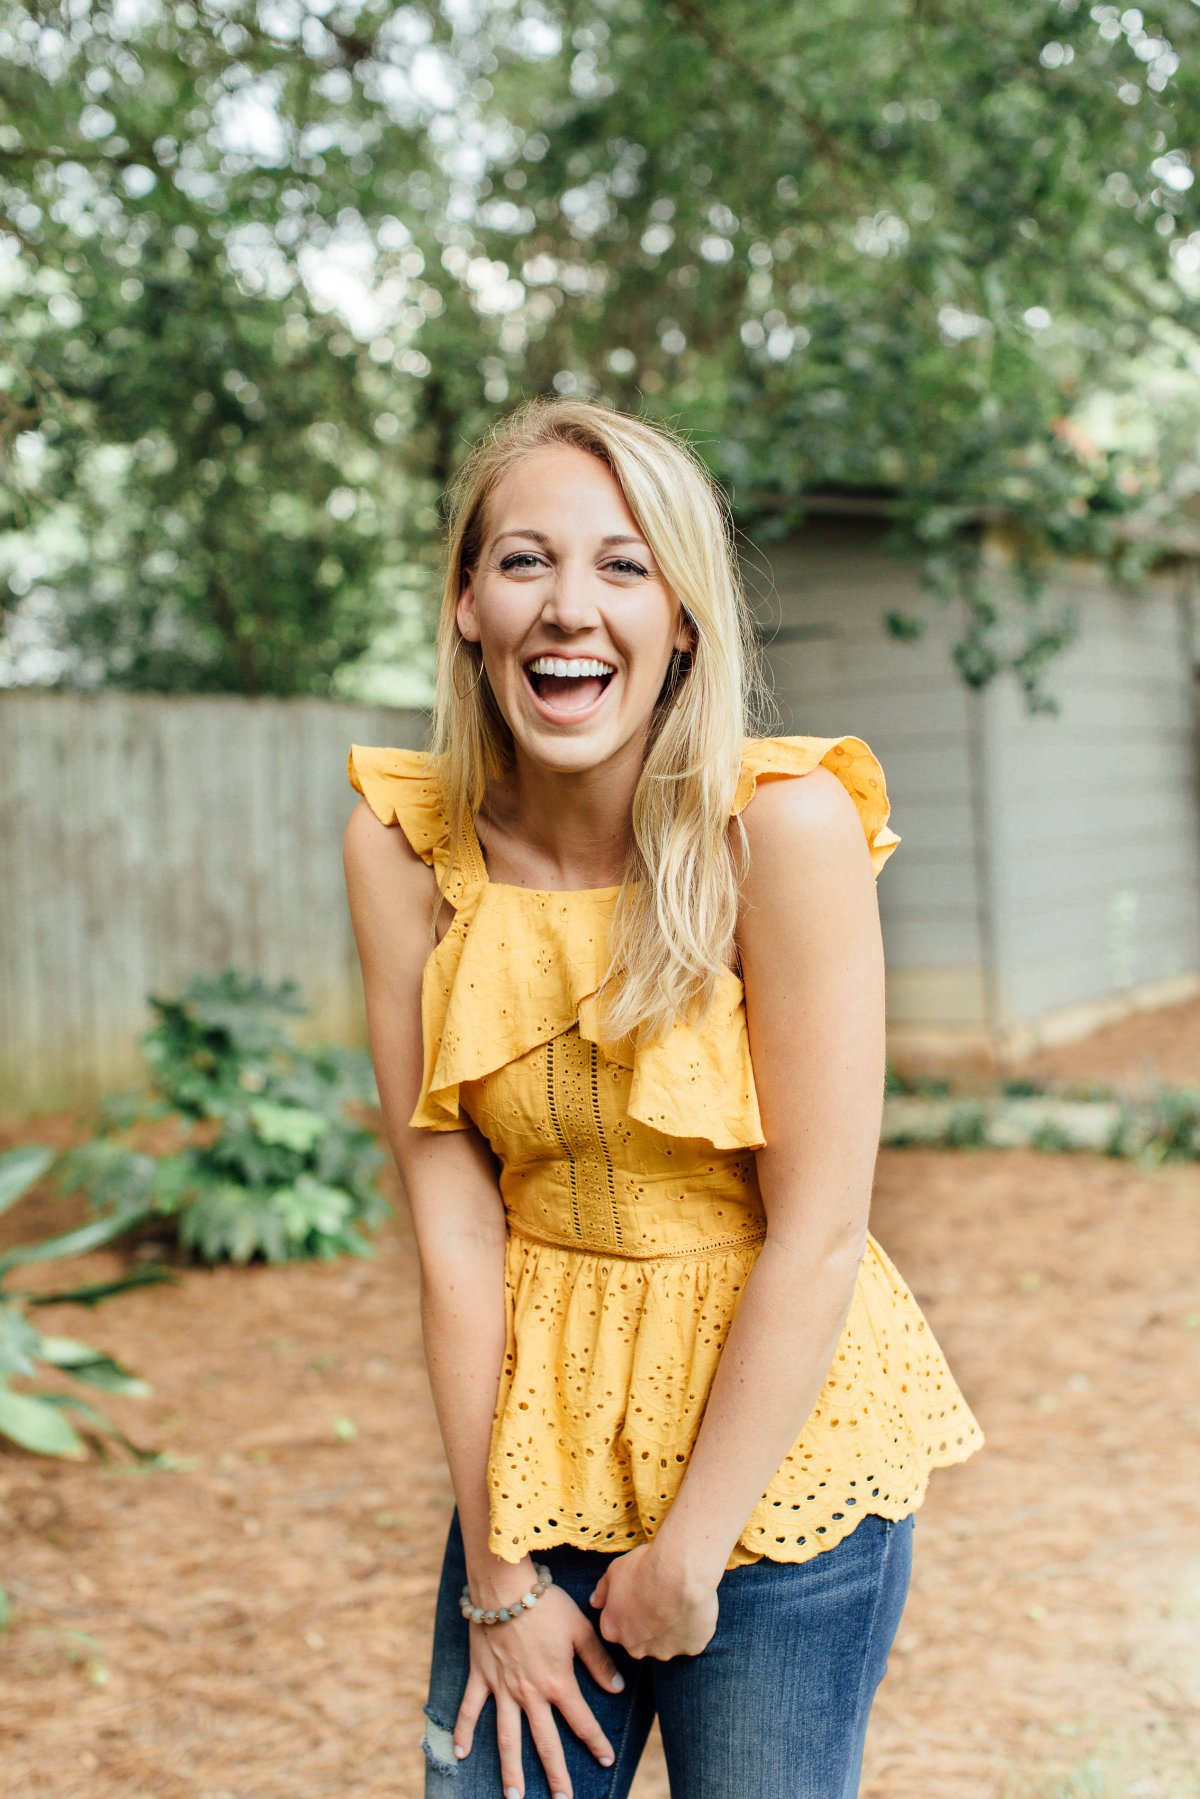 Meredith: Food & LifestyleBlogger